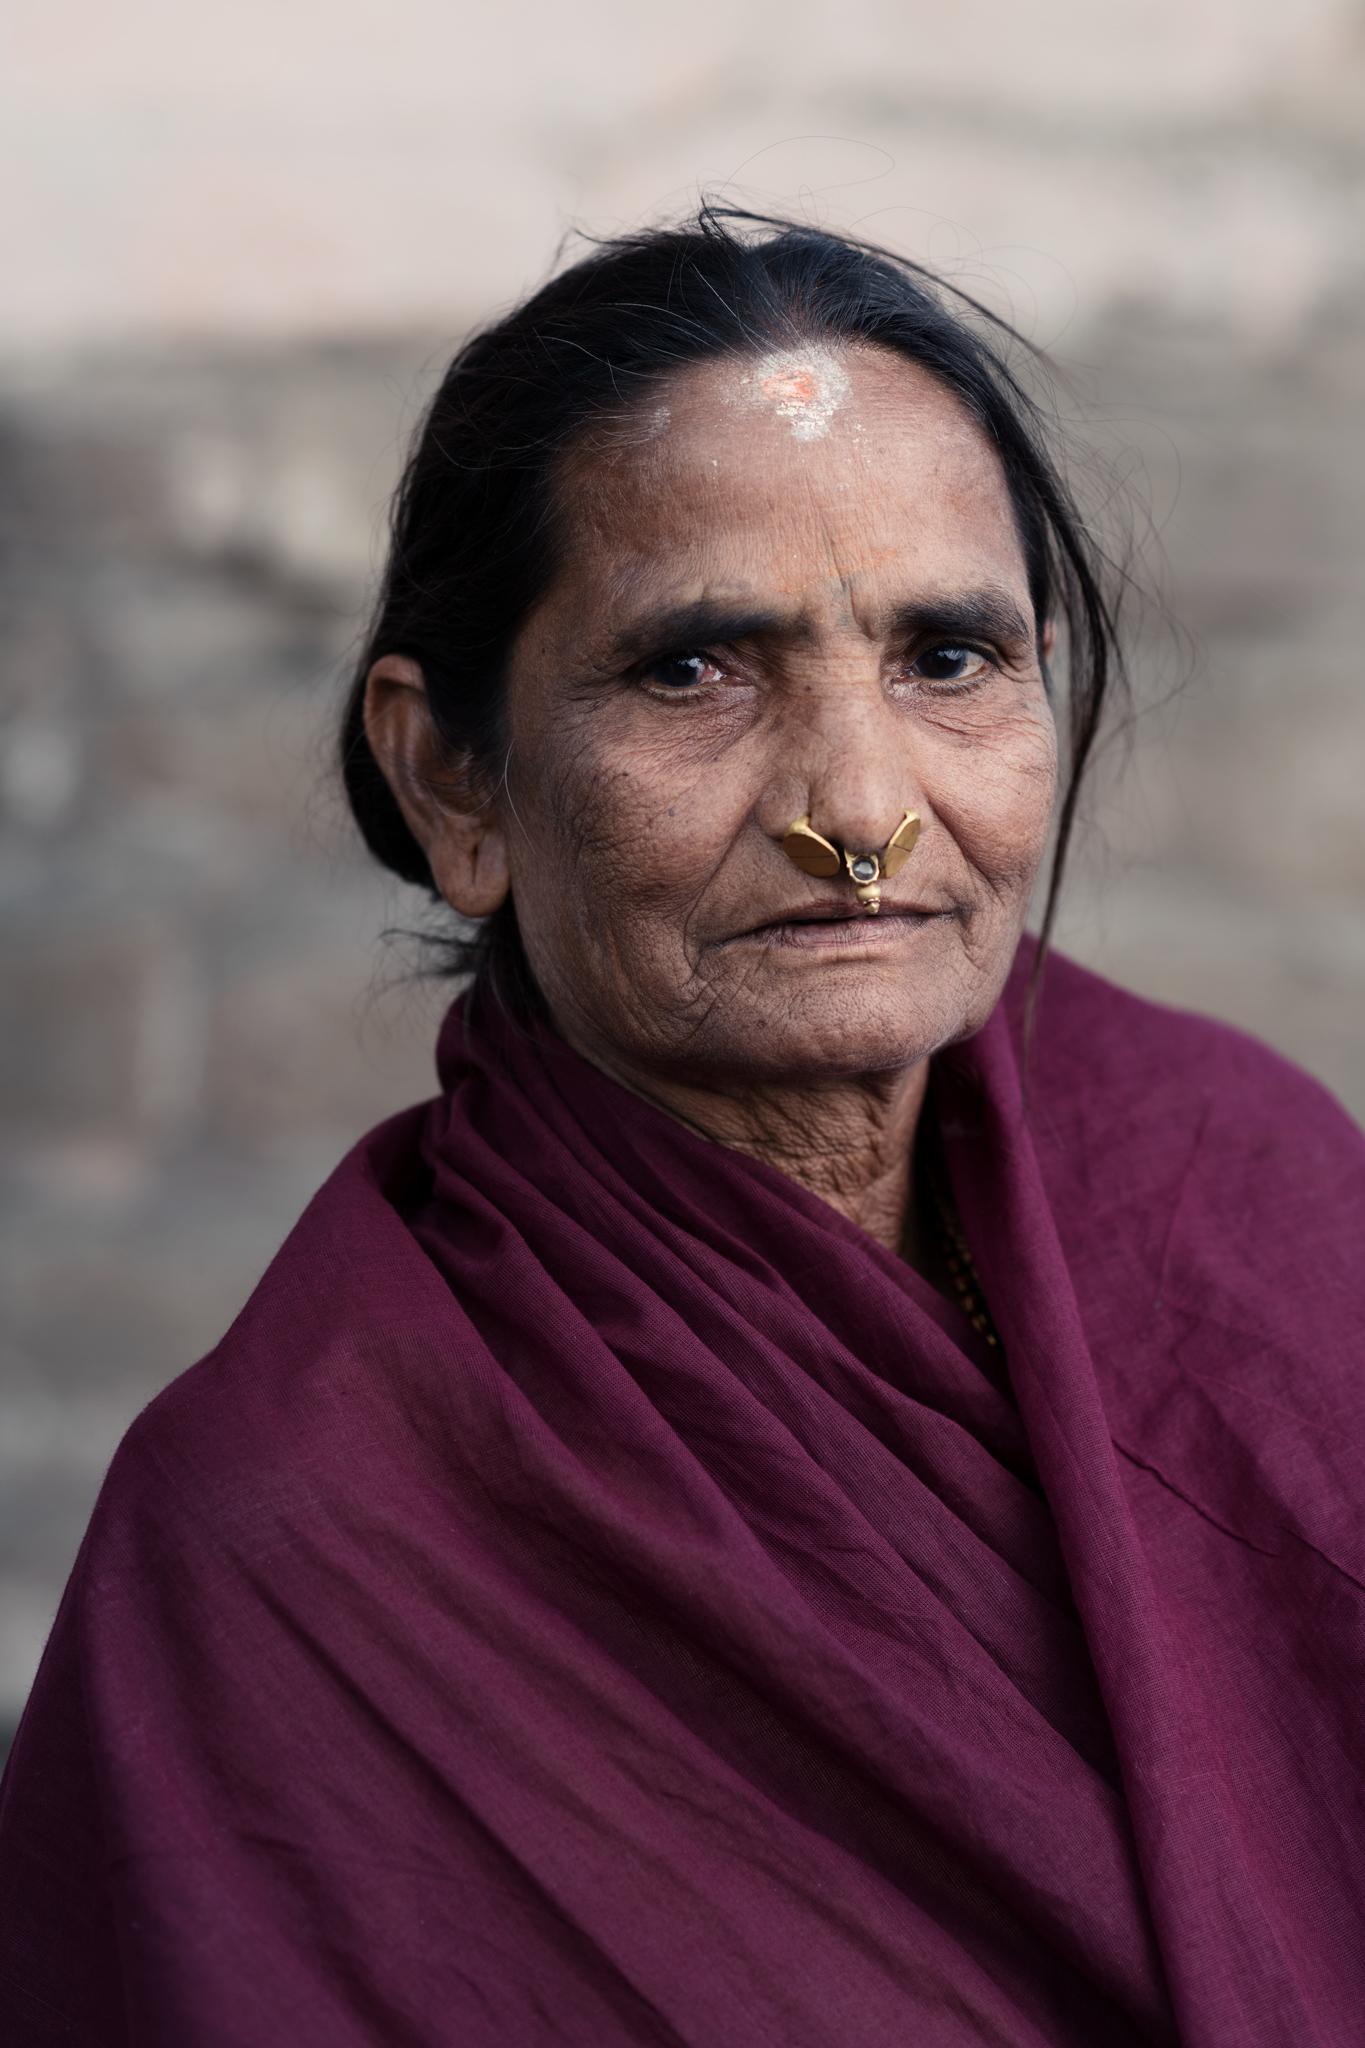 Varanasi_portrait_travel_photography_Manchester_Adventure_Photographer_Jan_Bella4.jpg